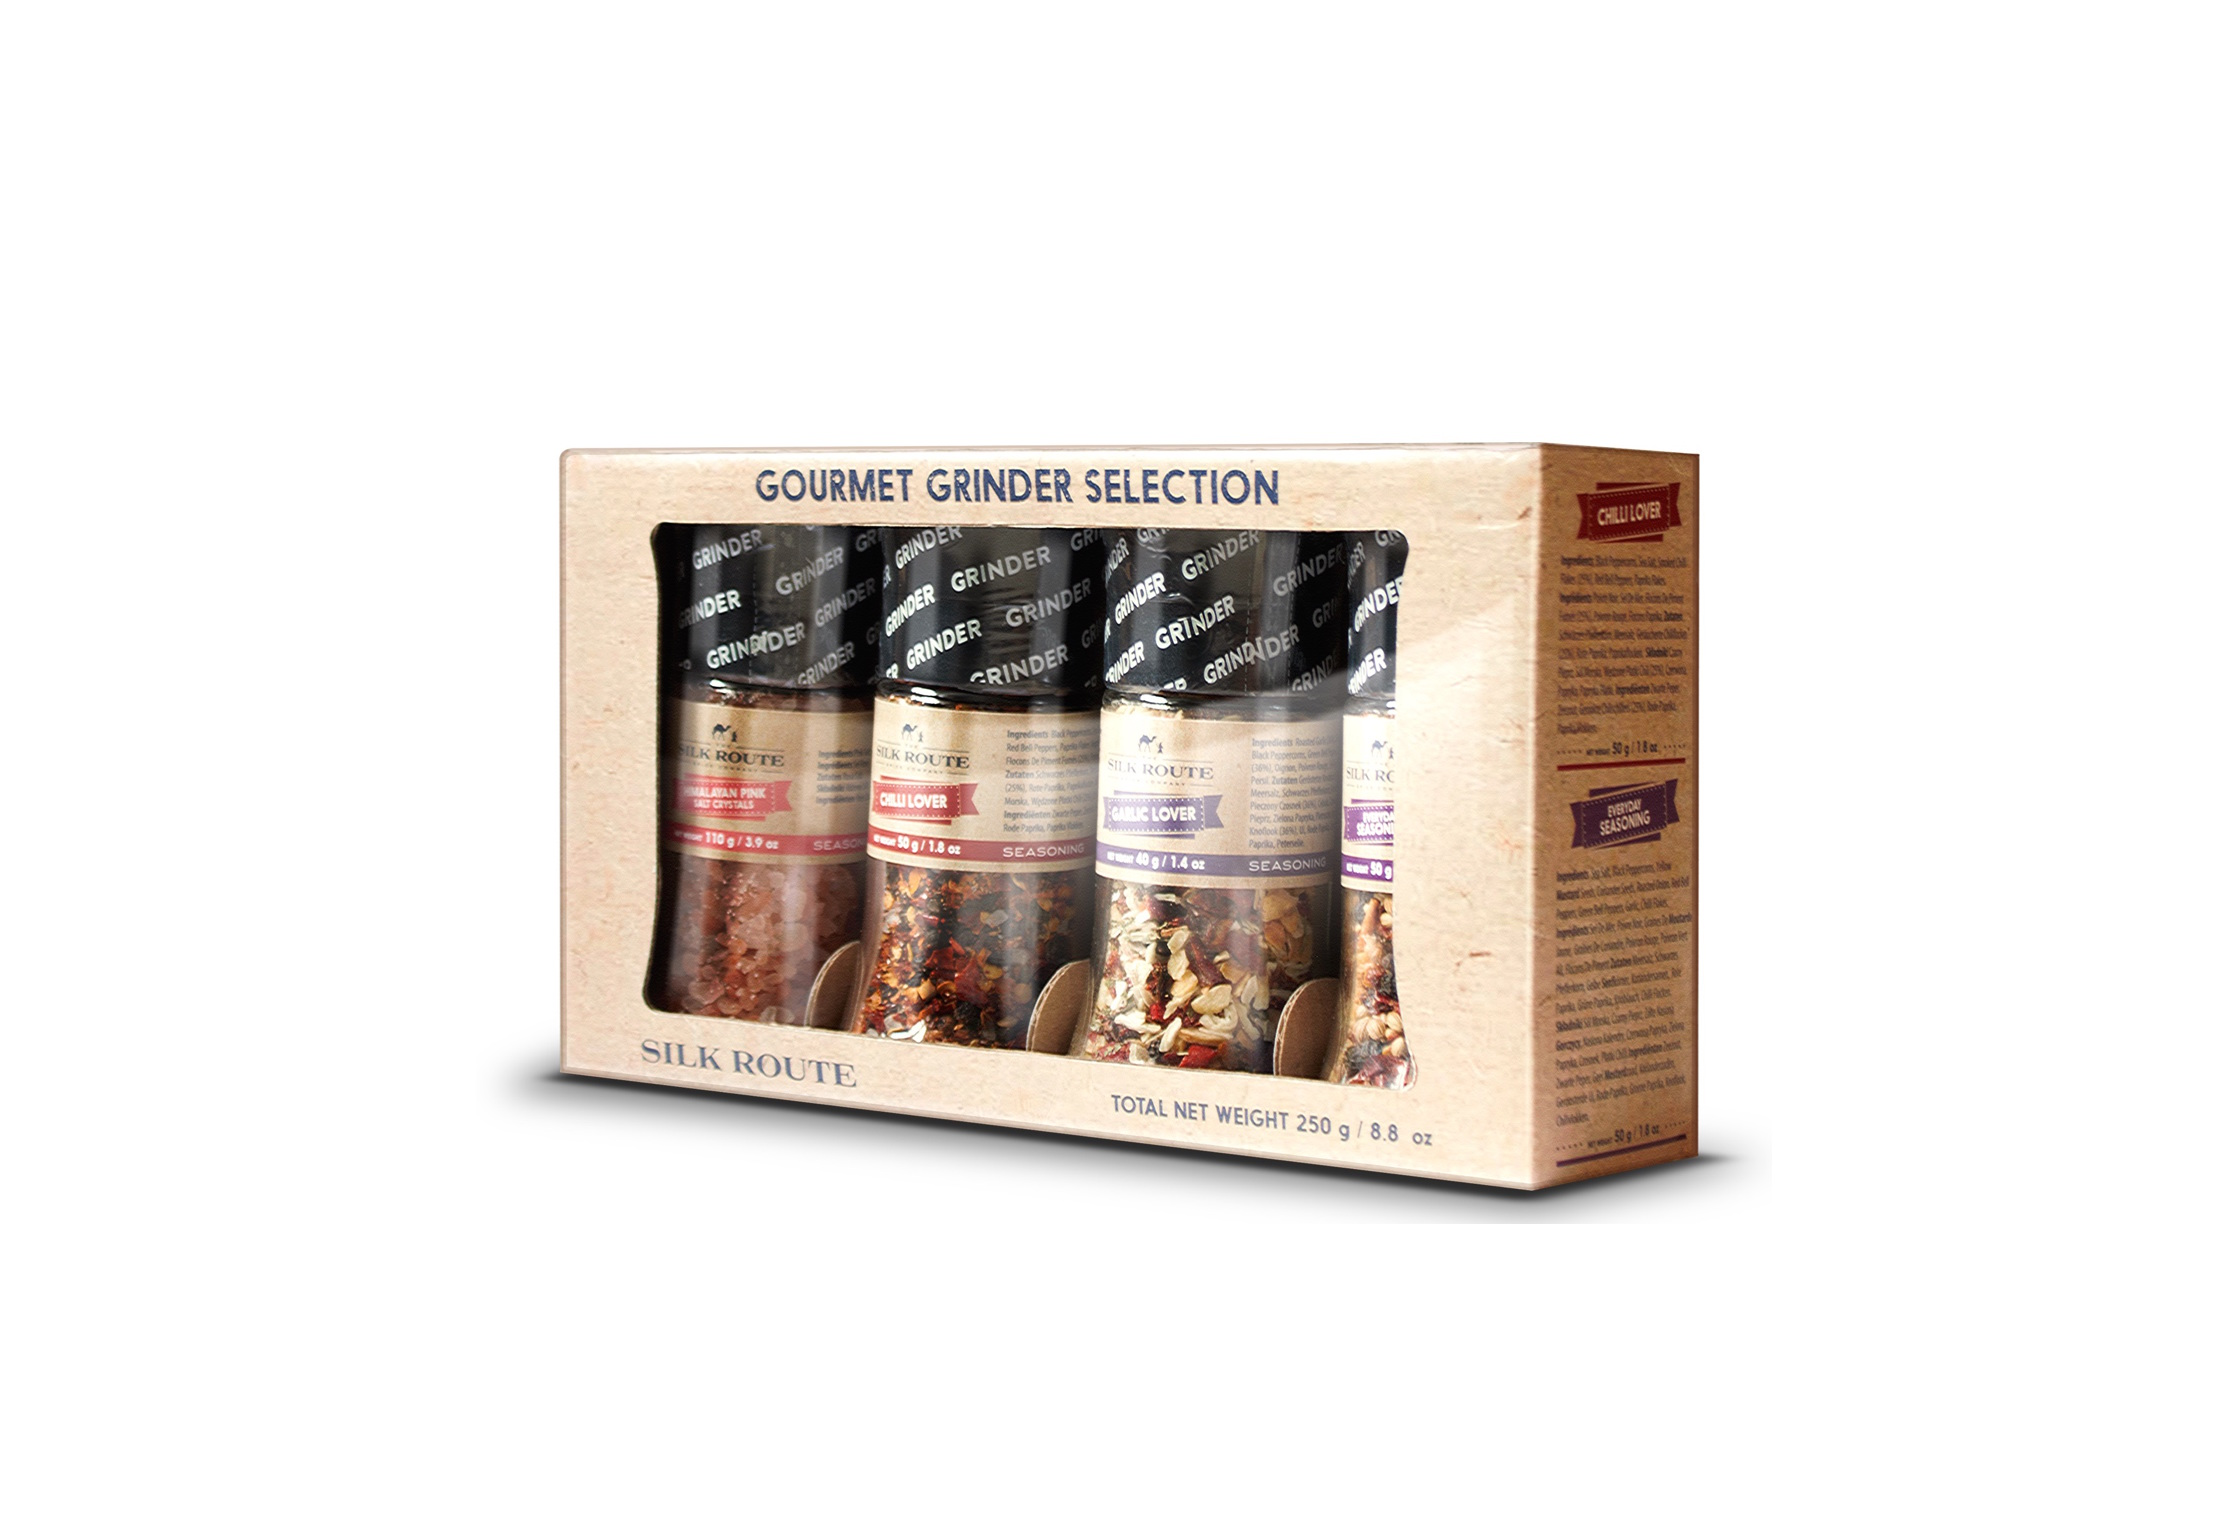 Spice Grinder Gift Set x 4 (Himalayan Pink Salt, Chili Lover, Garlic & Herb, Everyday Seasoning)